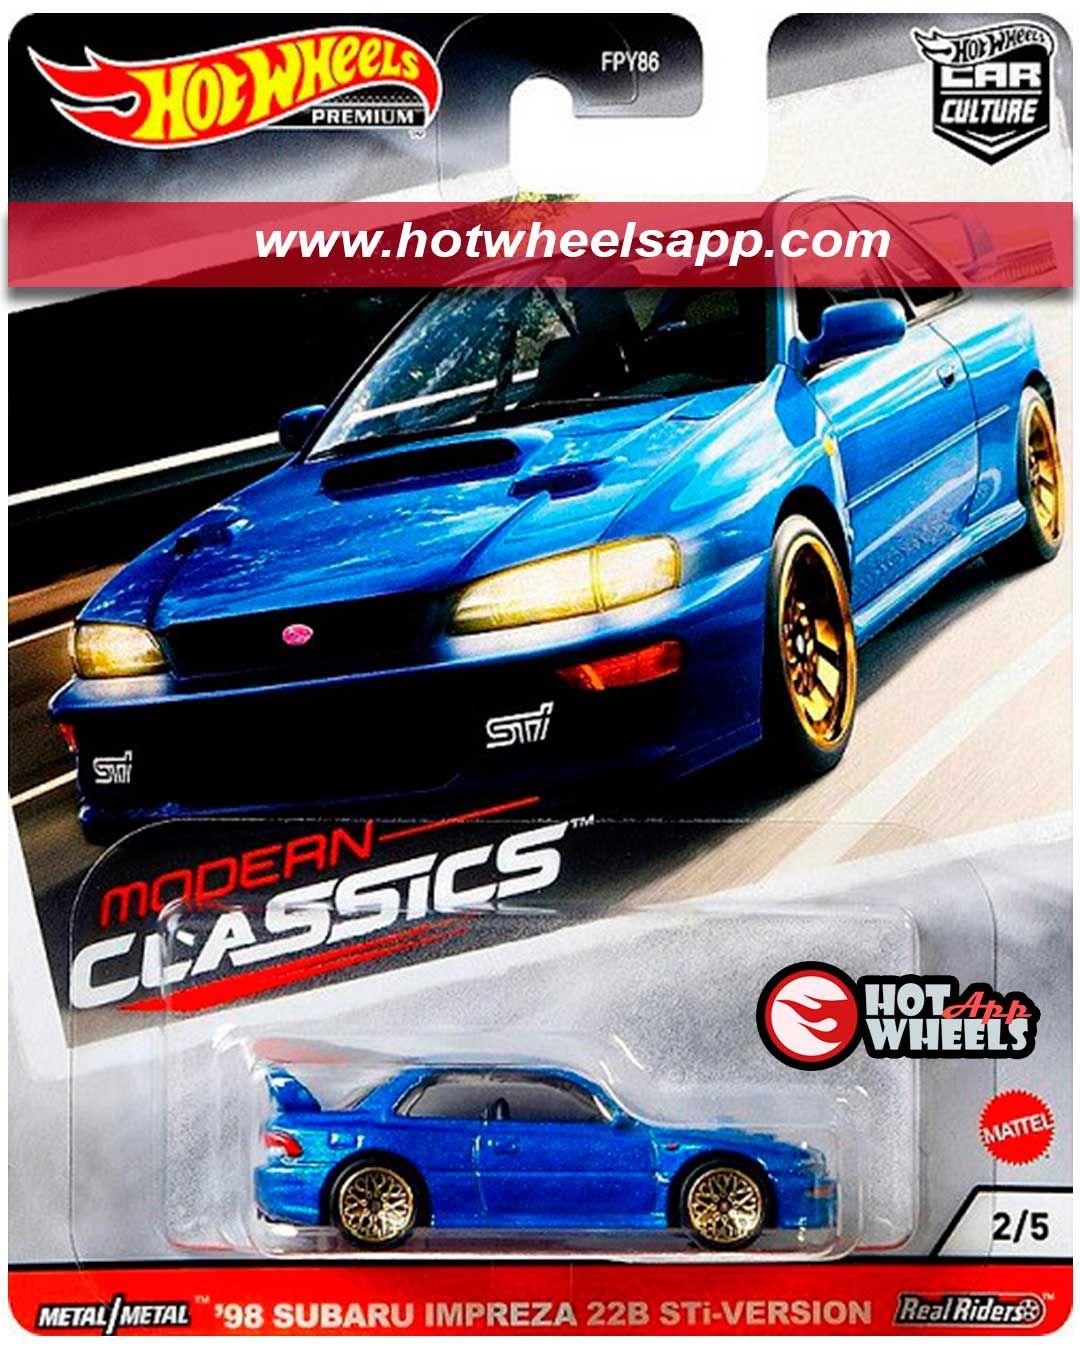 98 Subaru Impreza 22b Sti Version Hot Wheels Subaru Impreza Hot